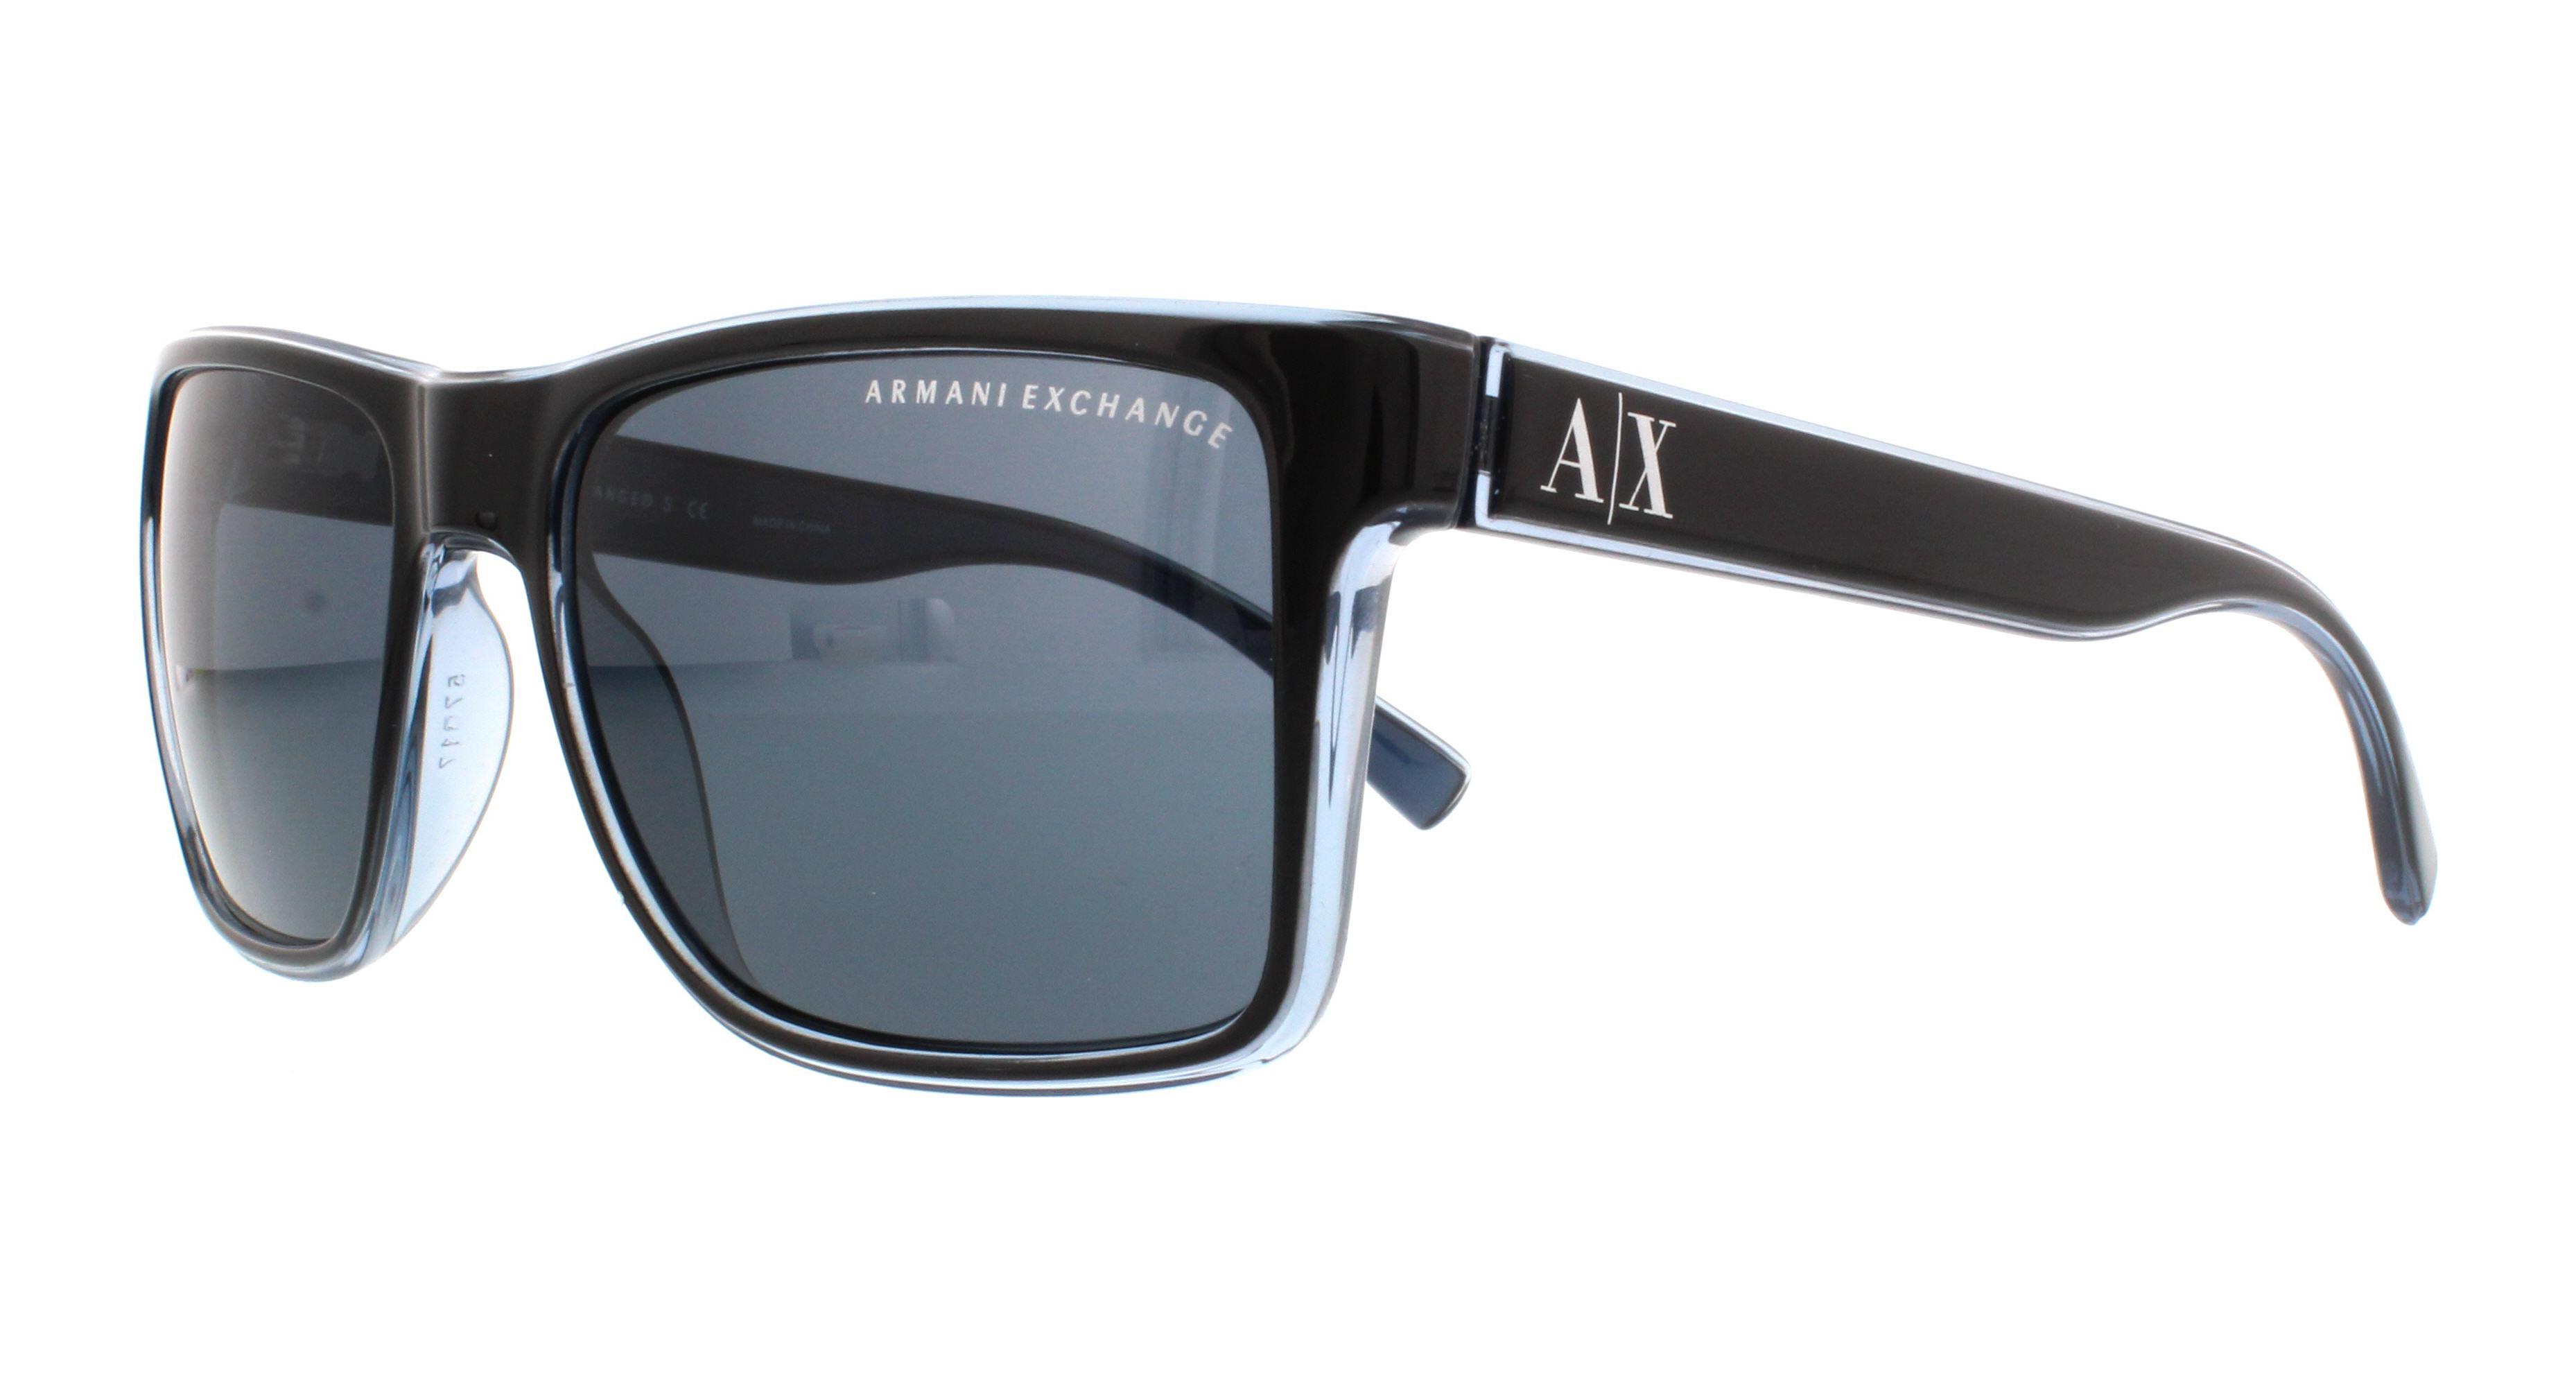 5cf09e1c84b Designer Frames Outlet. Armani Exchange AX4016